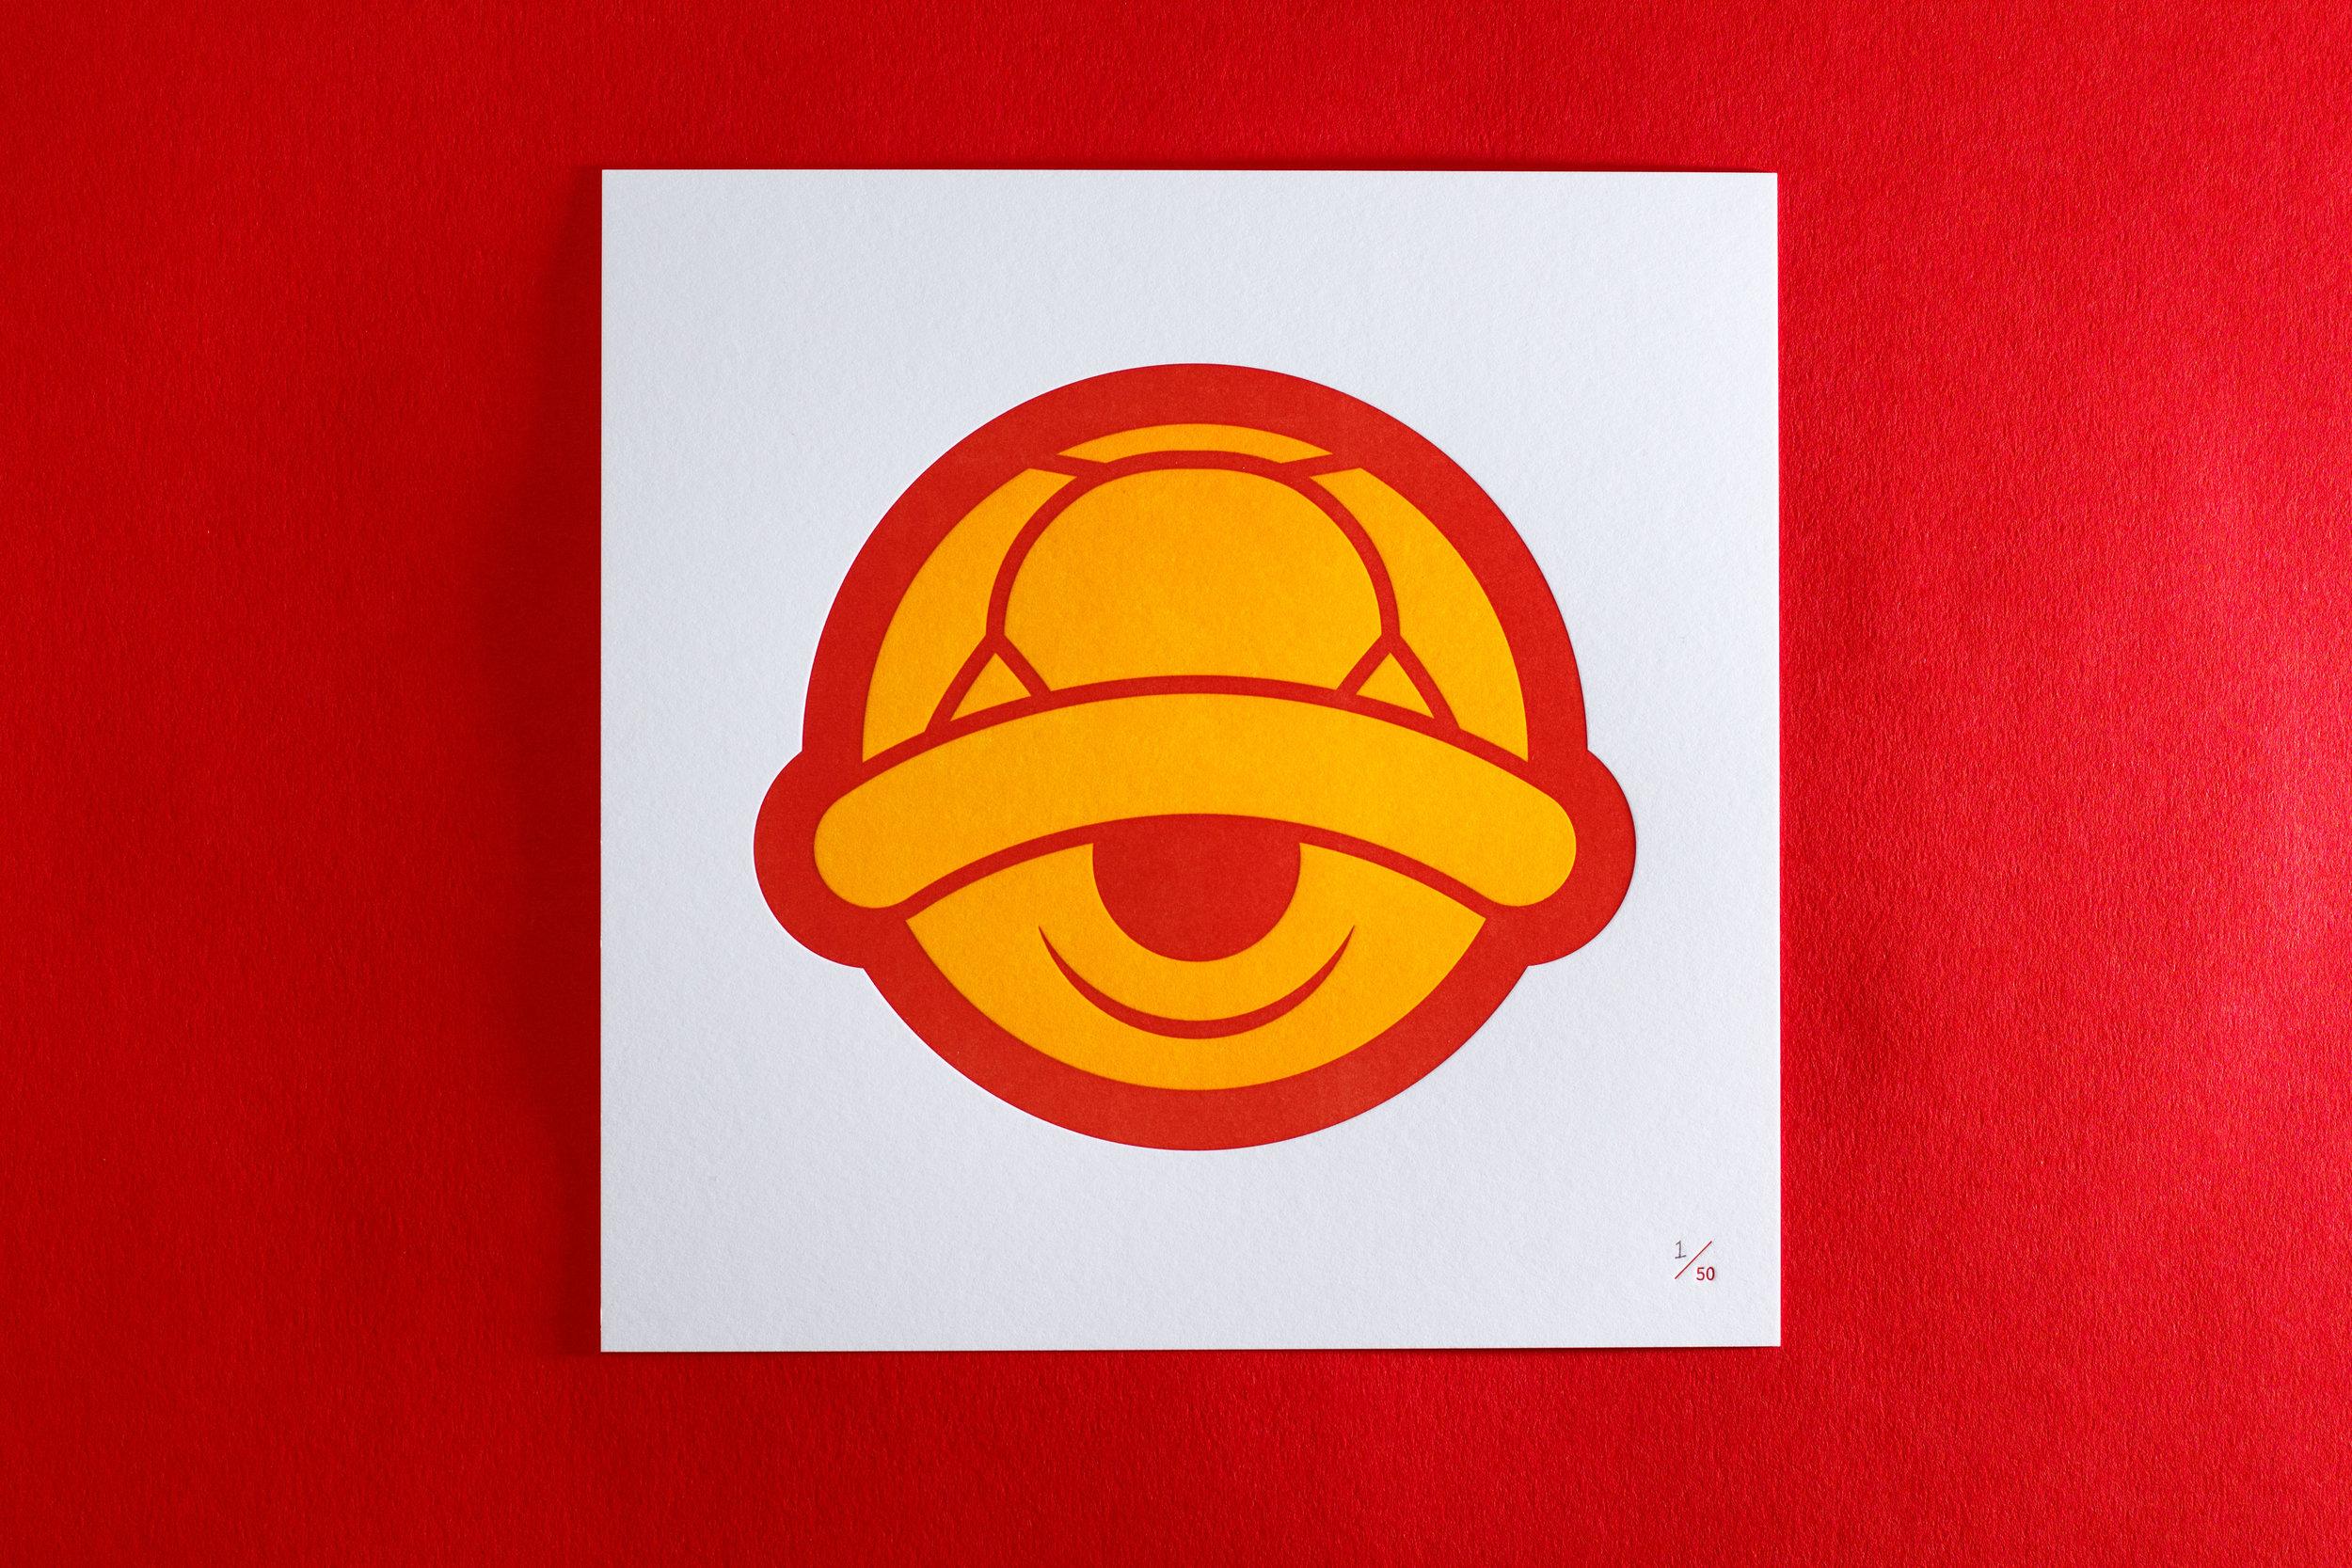 RedTiePosters-2152-shell-Ant Tran.jpg